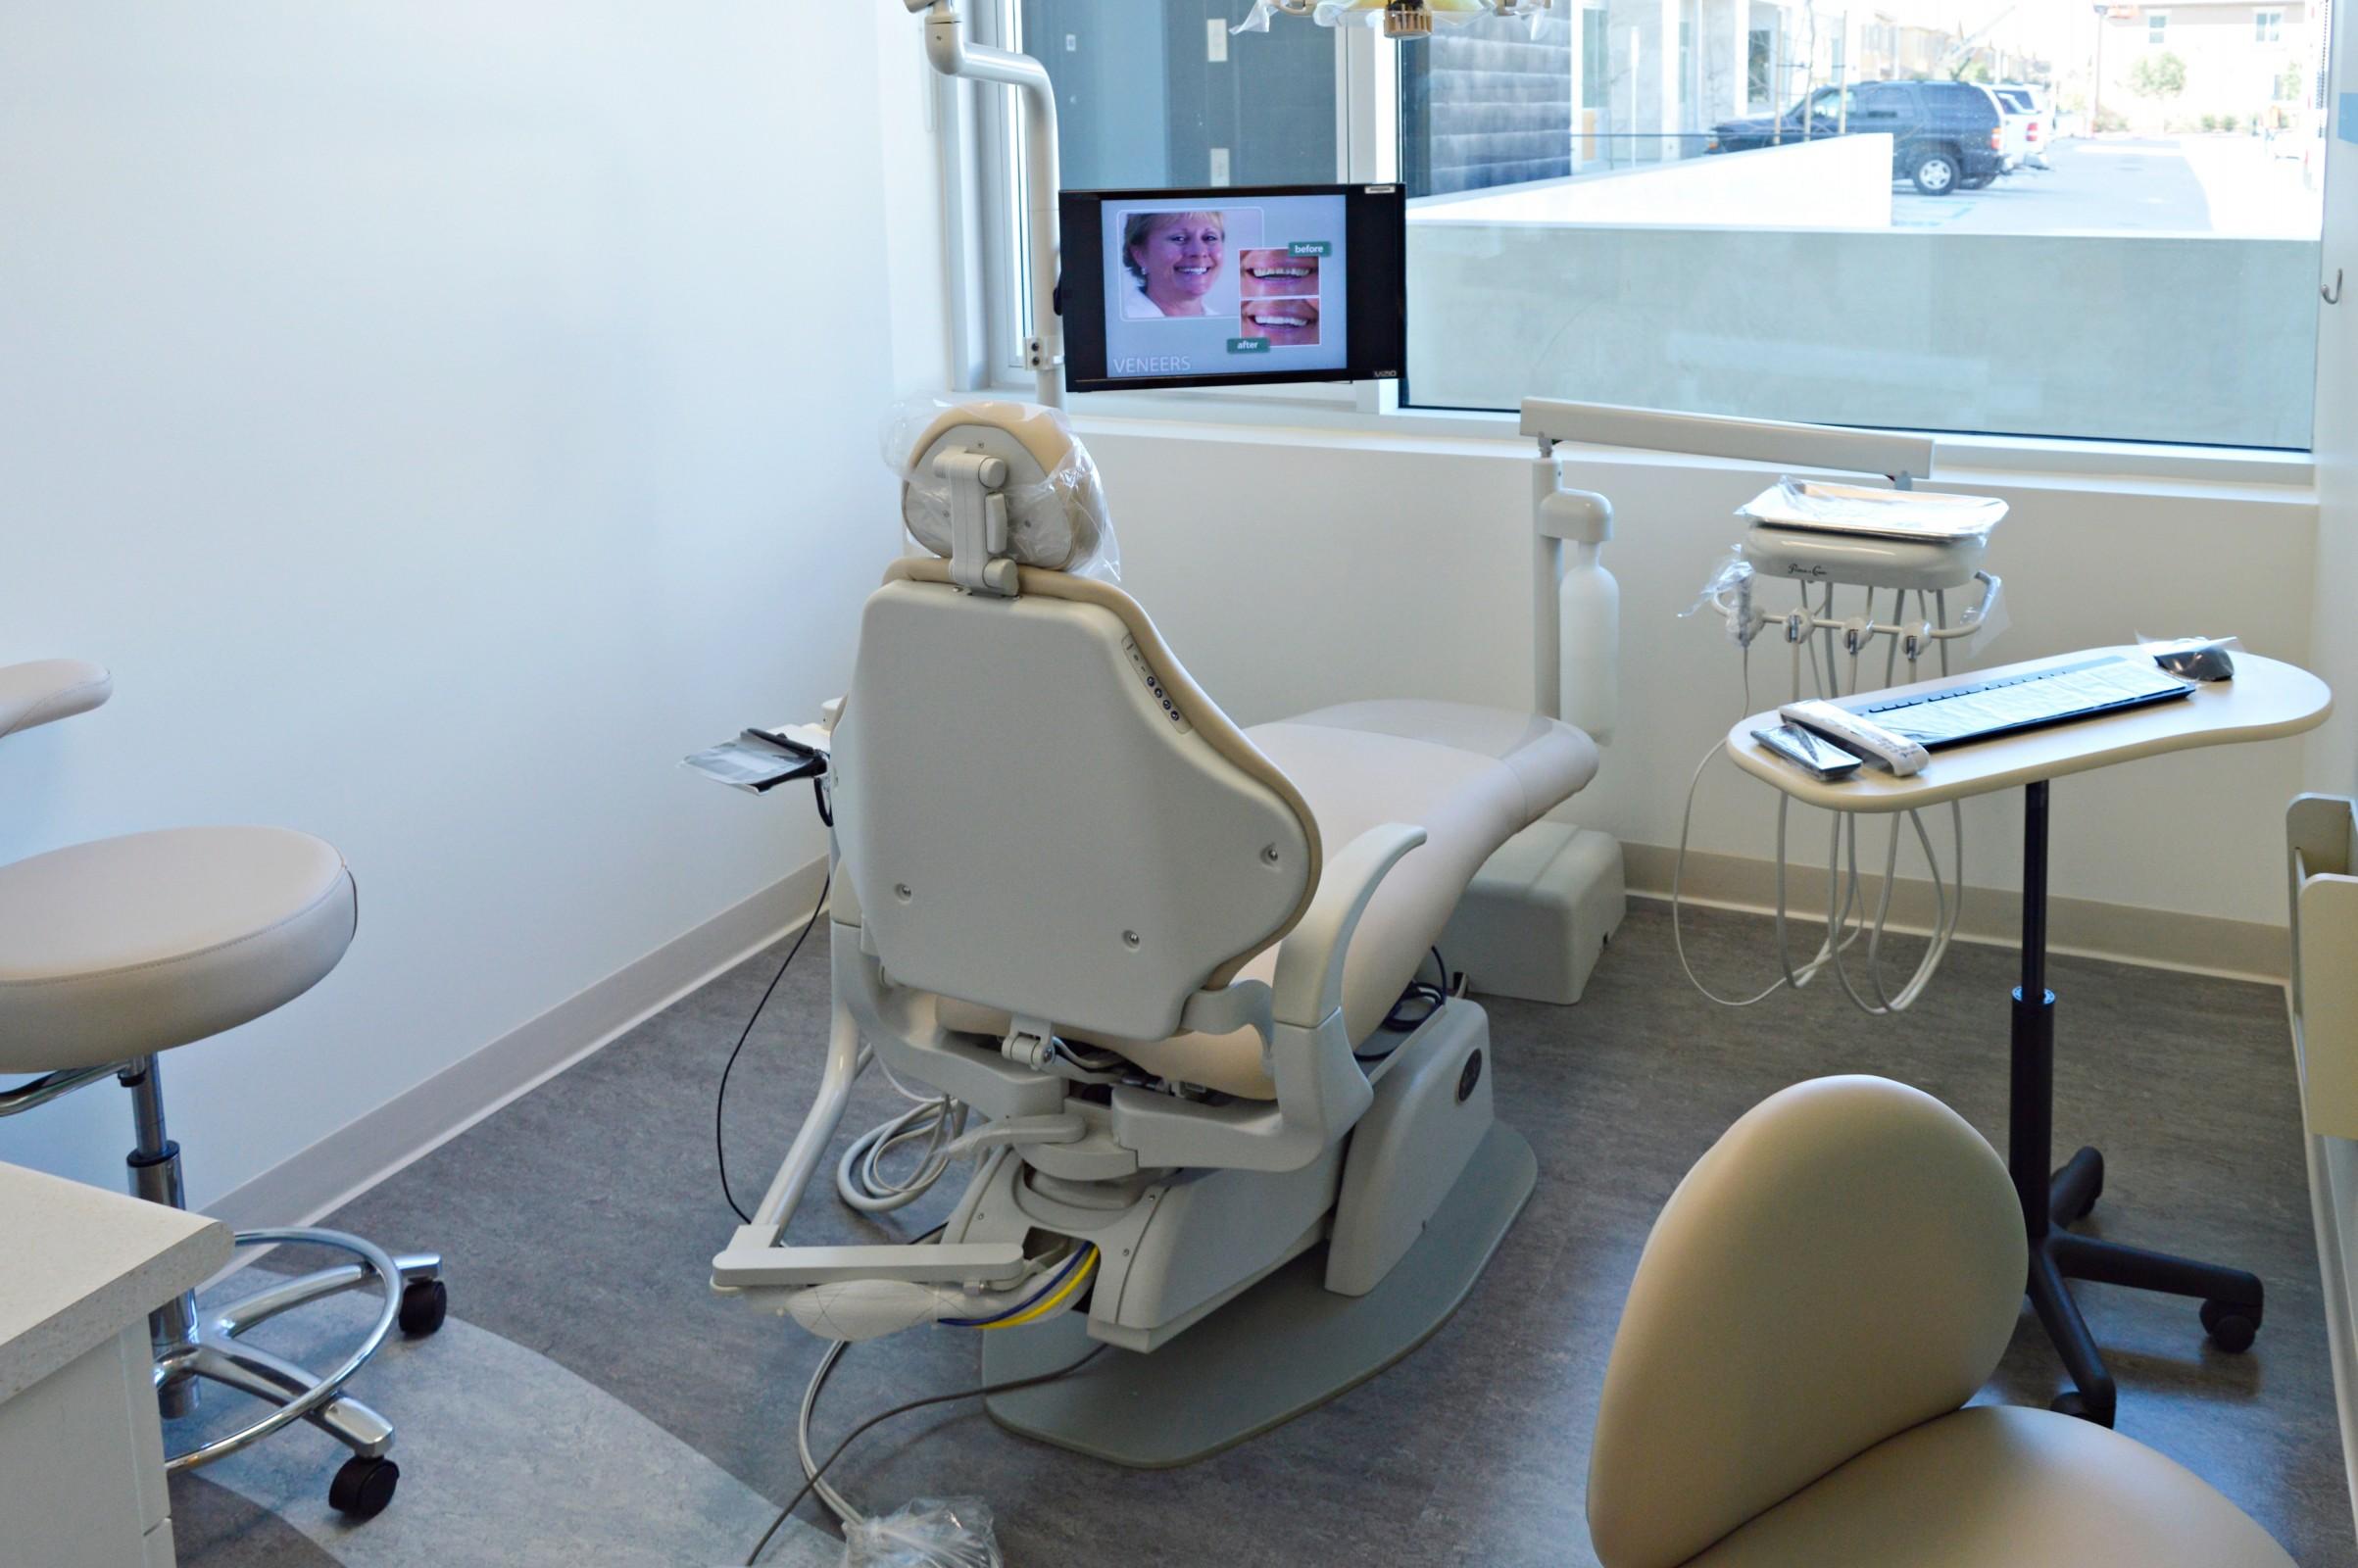 Carmel Valley Dentist Office and Orthodontics image 4